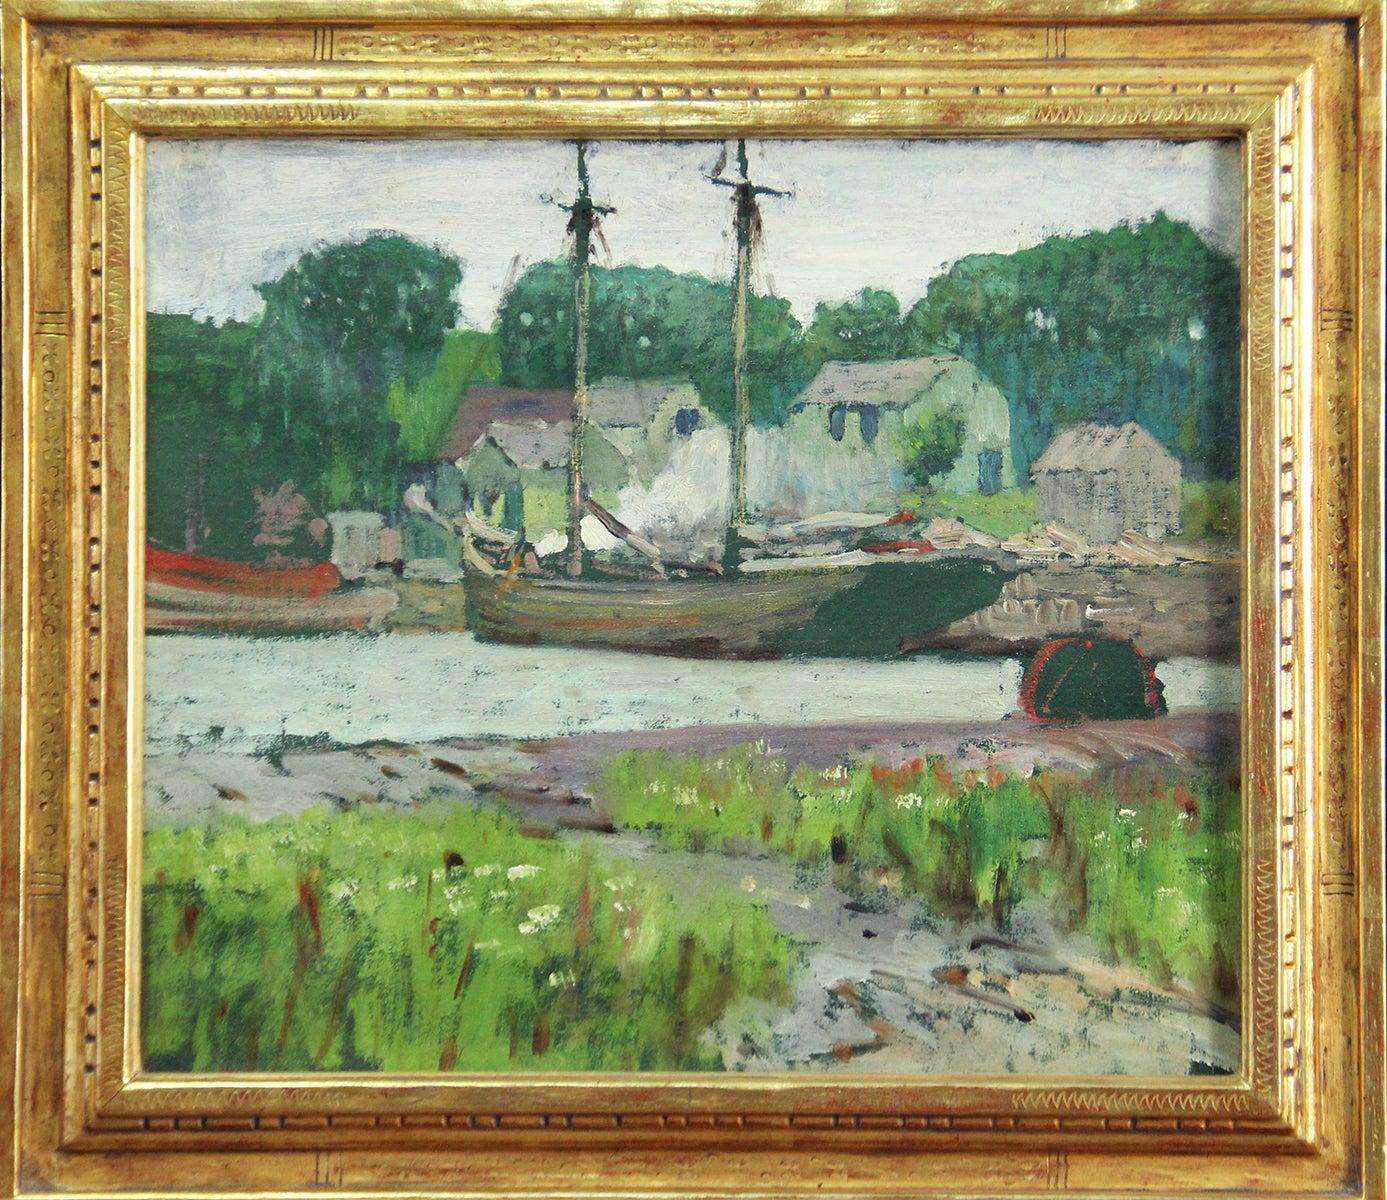 Fisherman's Cove, American Impressionist, Harbor Scene, Ben Badura Frame